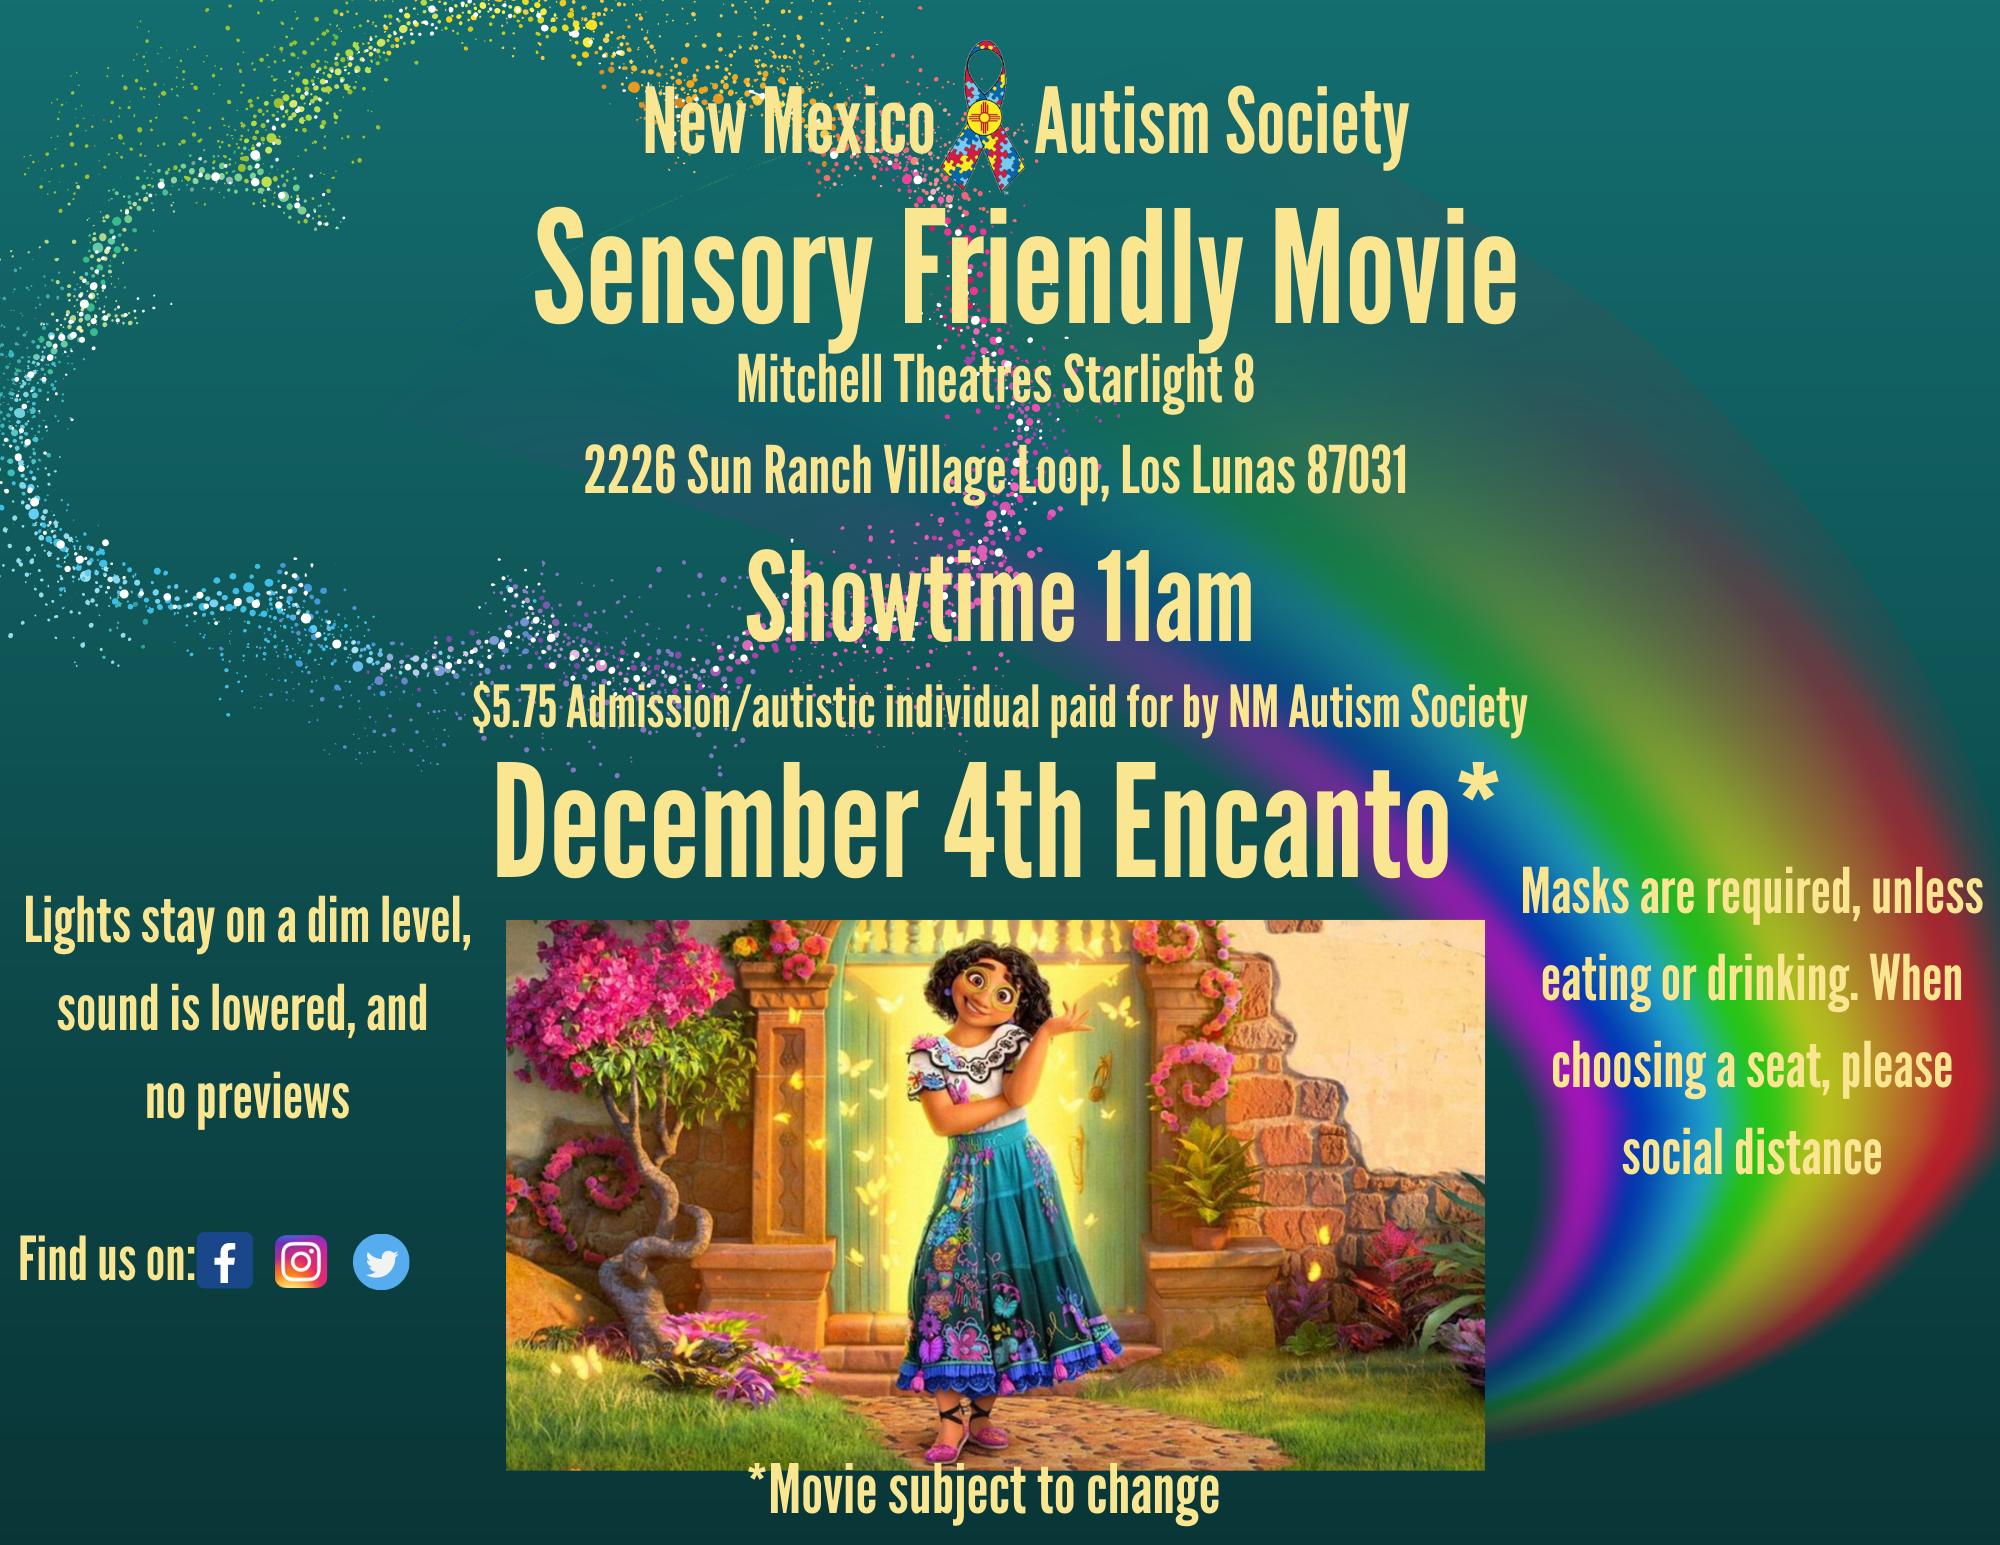 Sensory Friendly Movie - Encanto Image